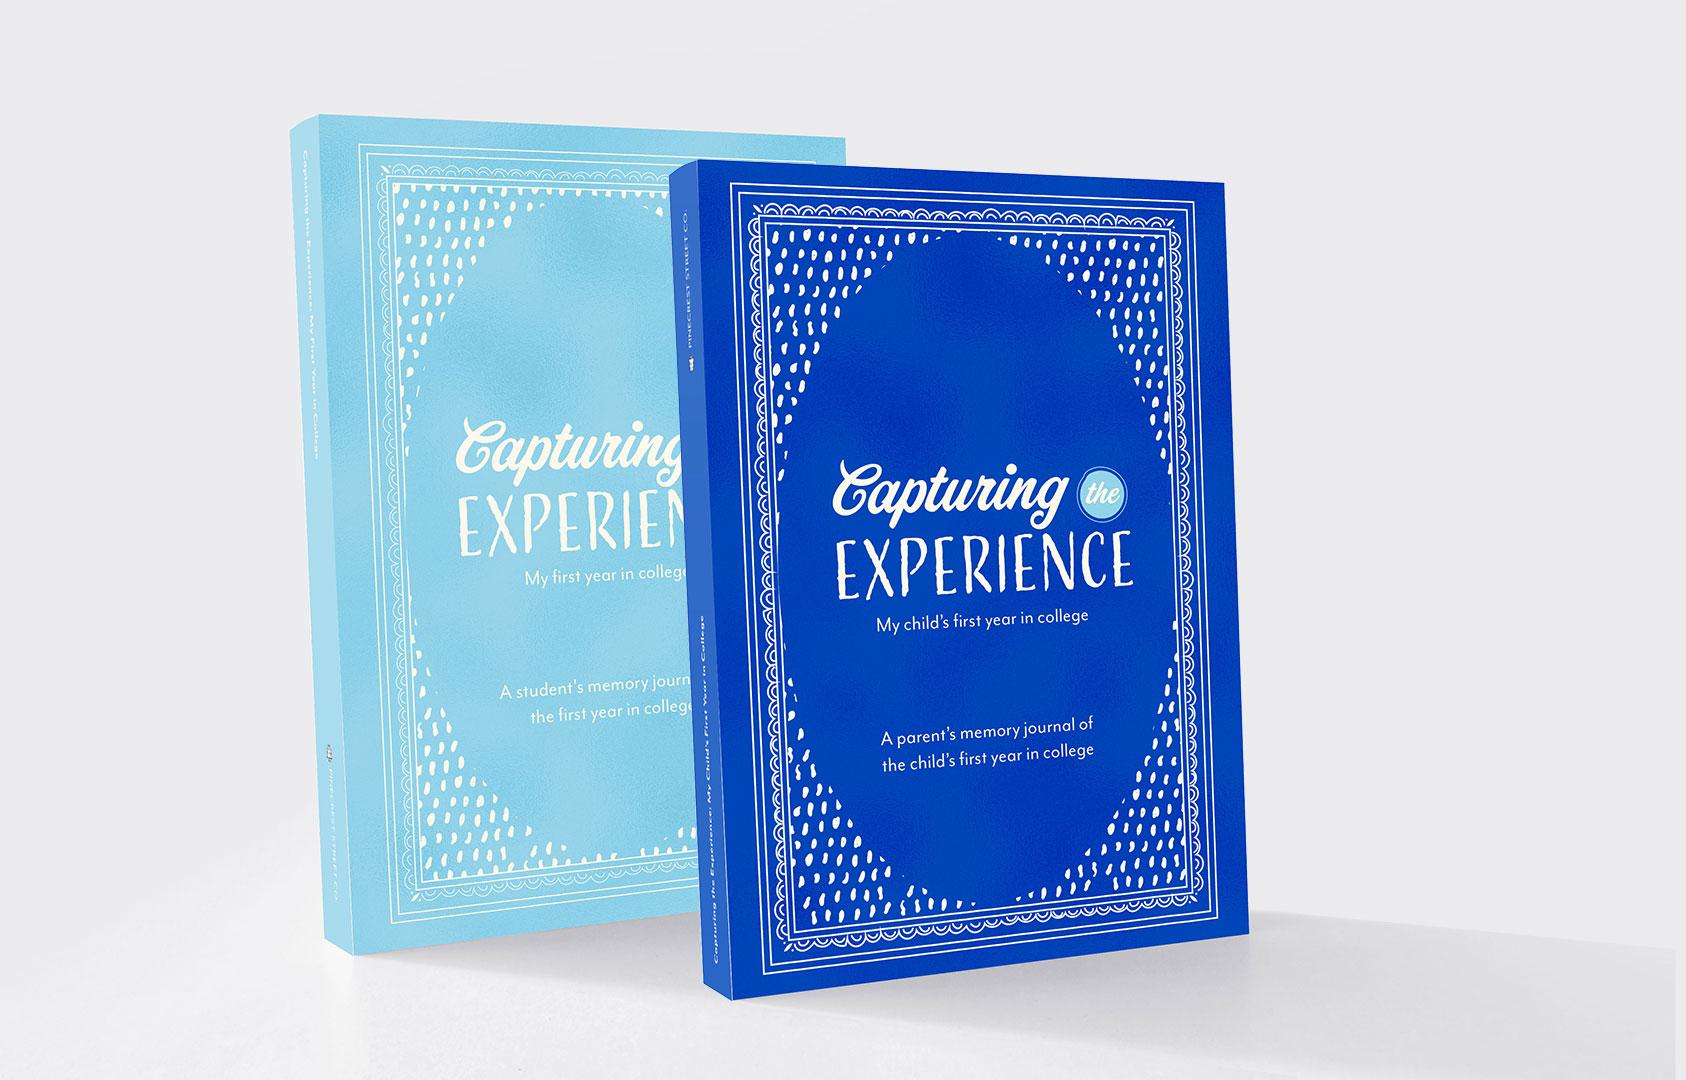 CapturingtheExperience_Books.jpg